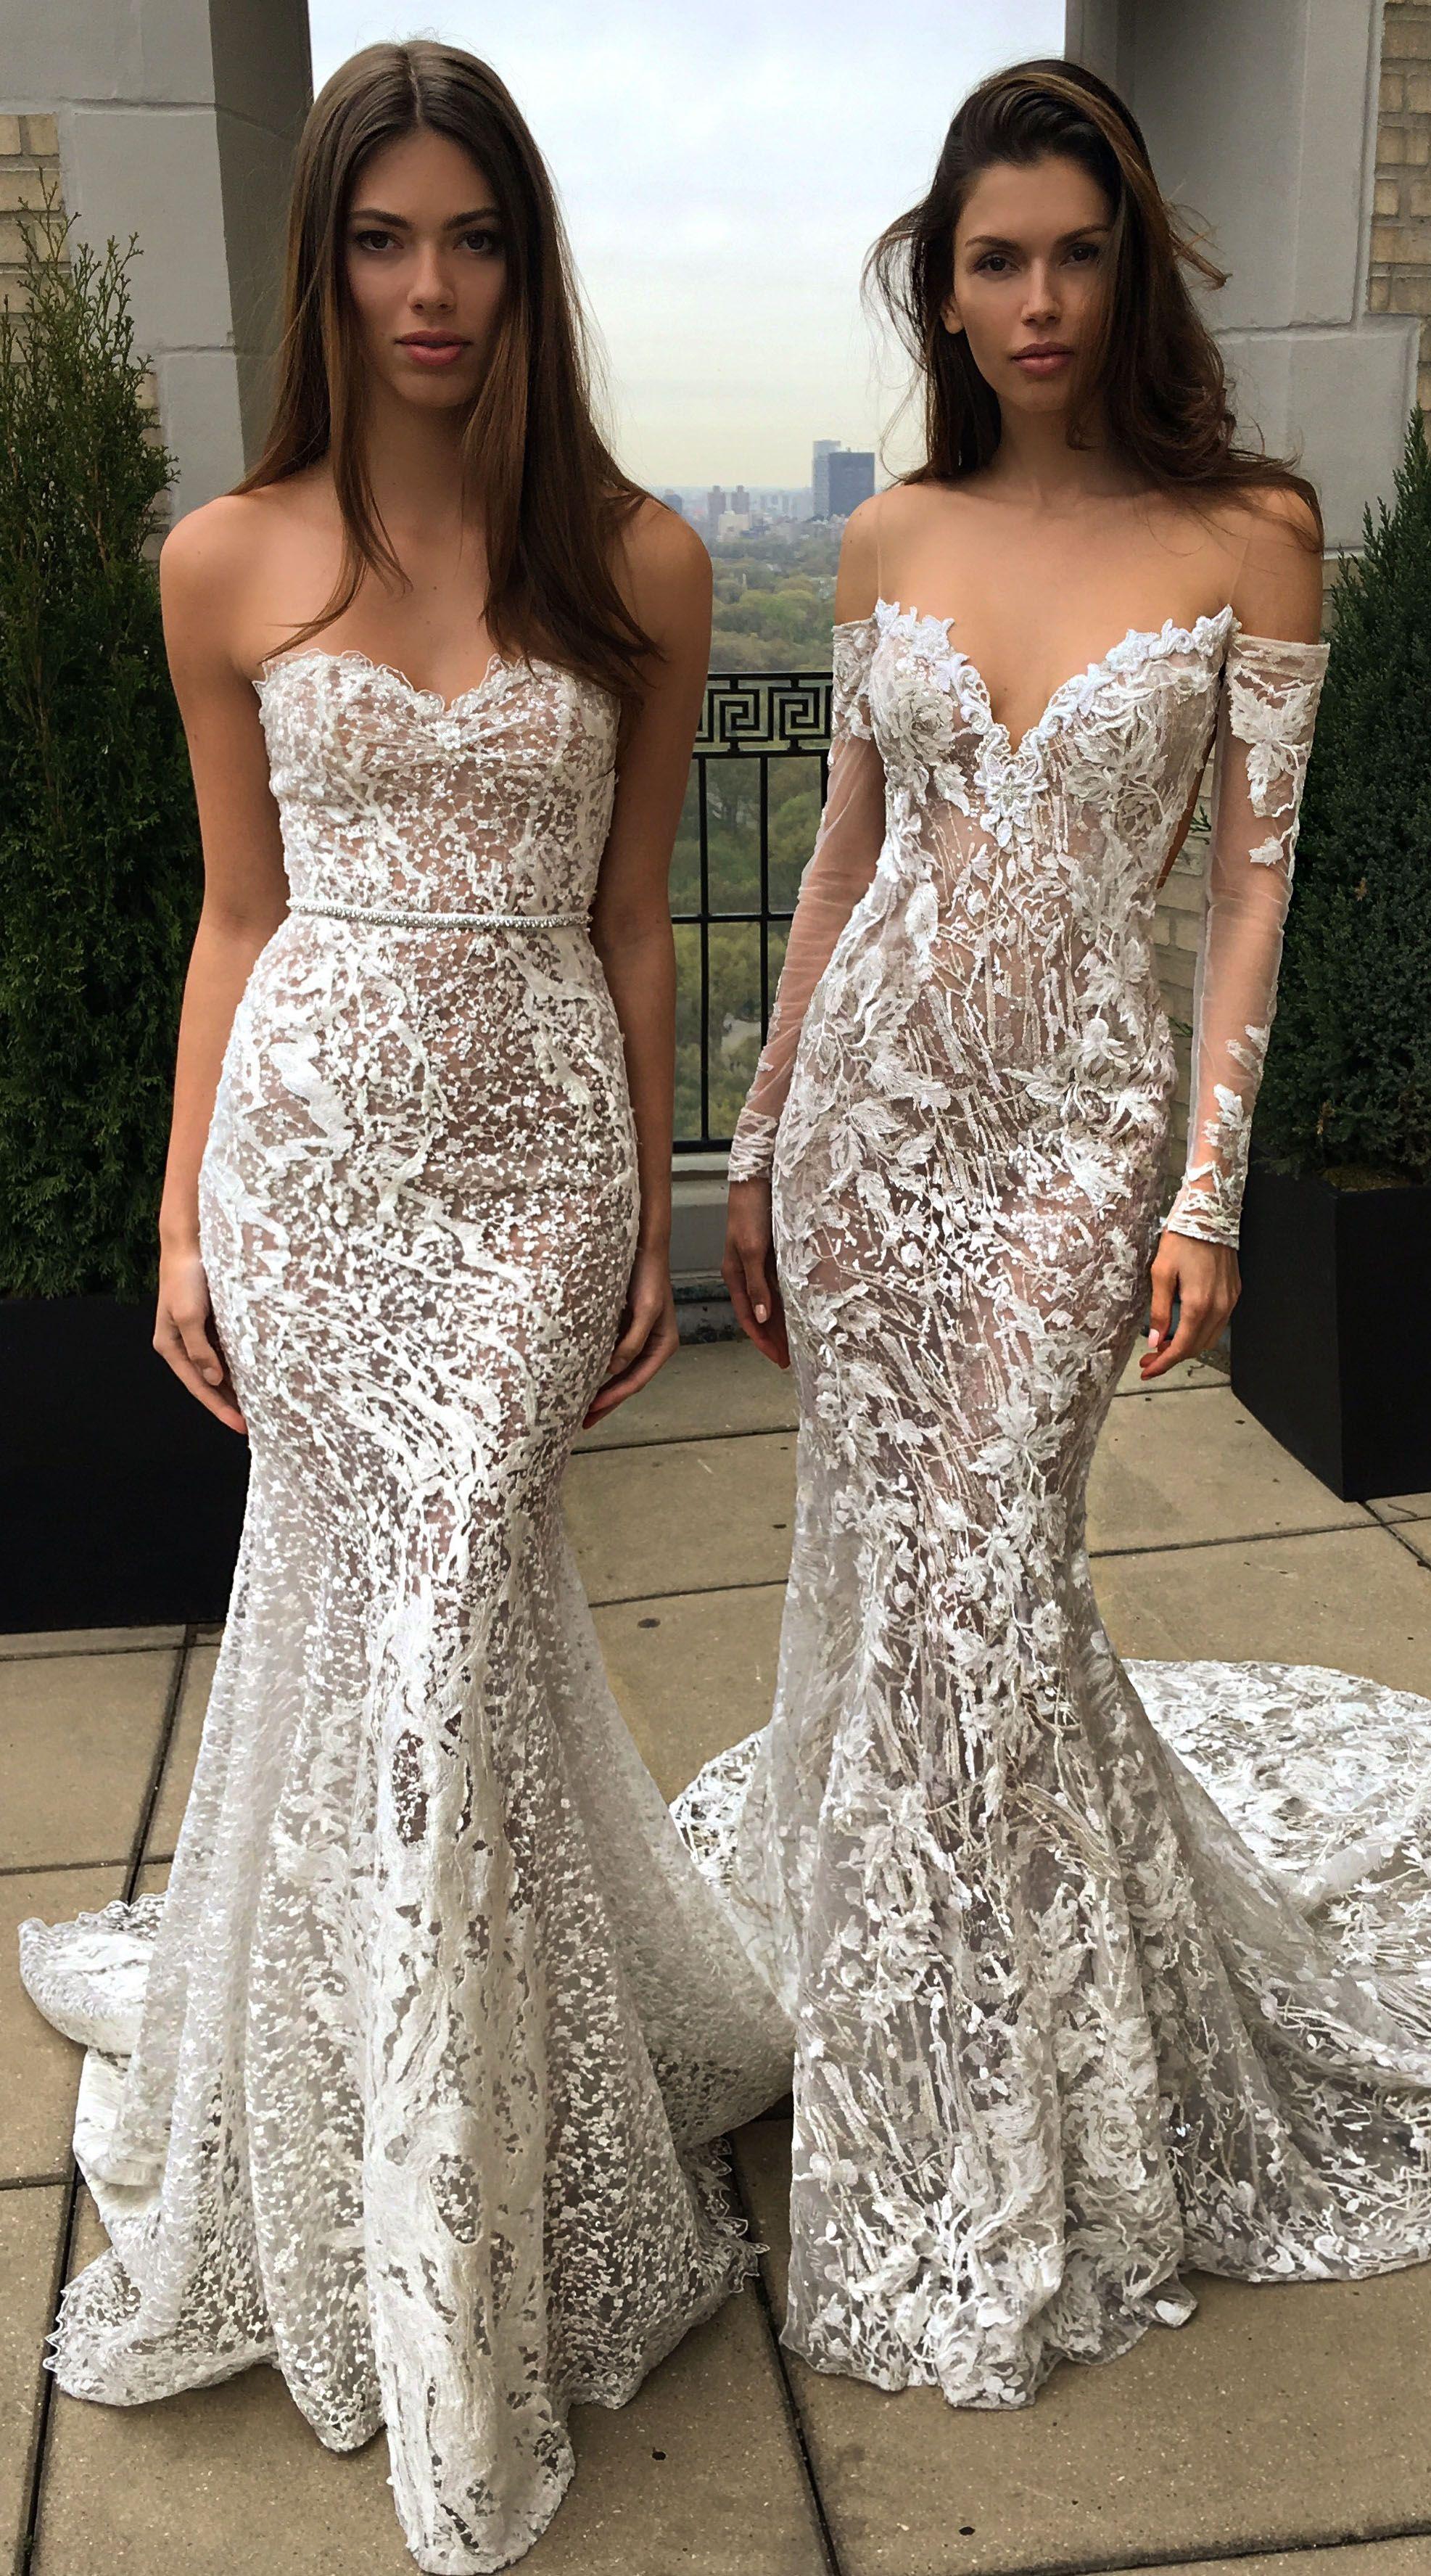 Subtly sexy styles by @bertabridal   Weddings • Fashion • Beauty ...